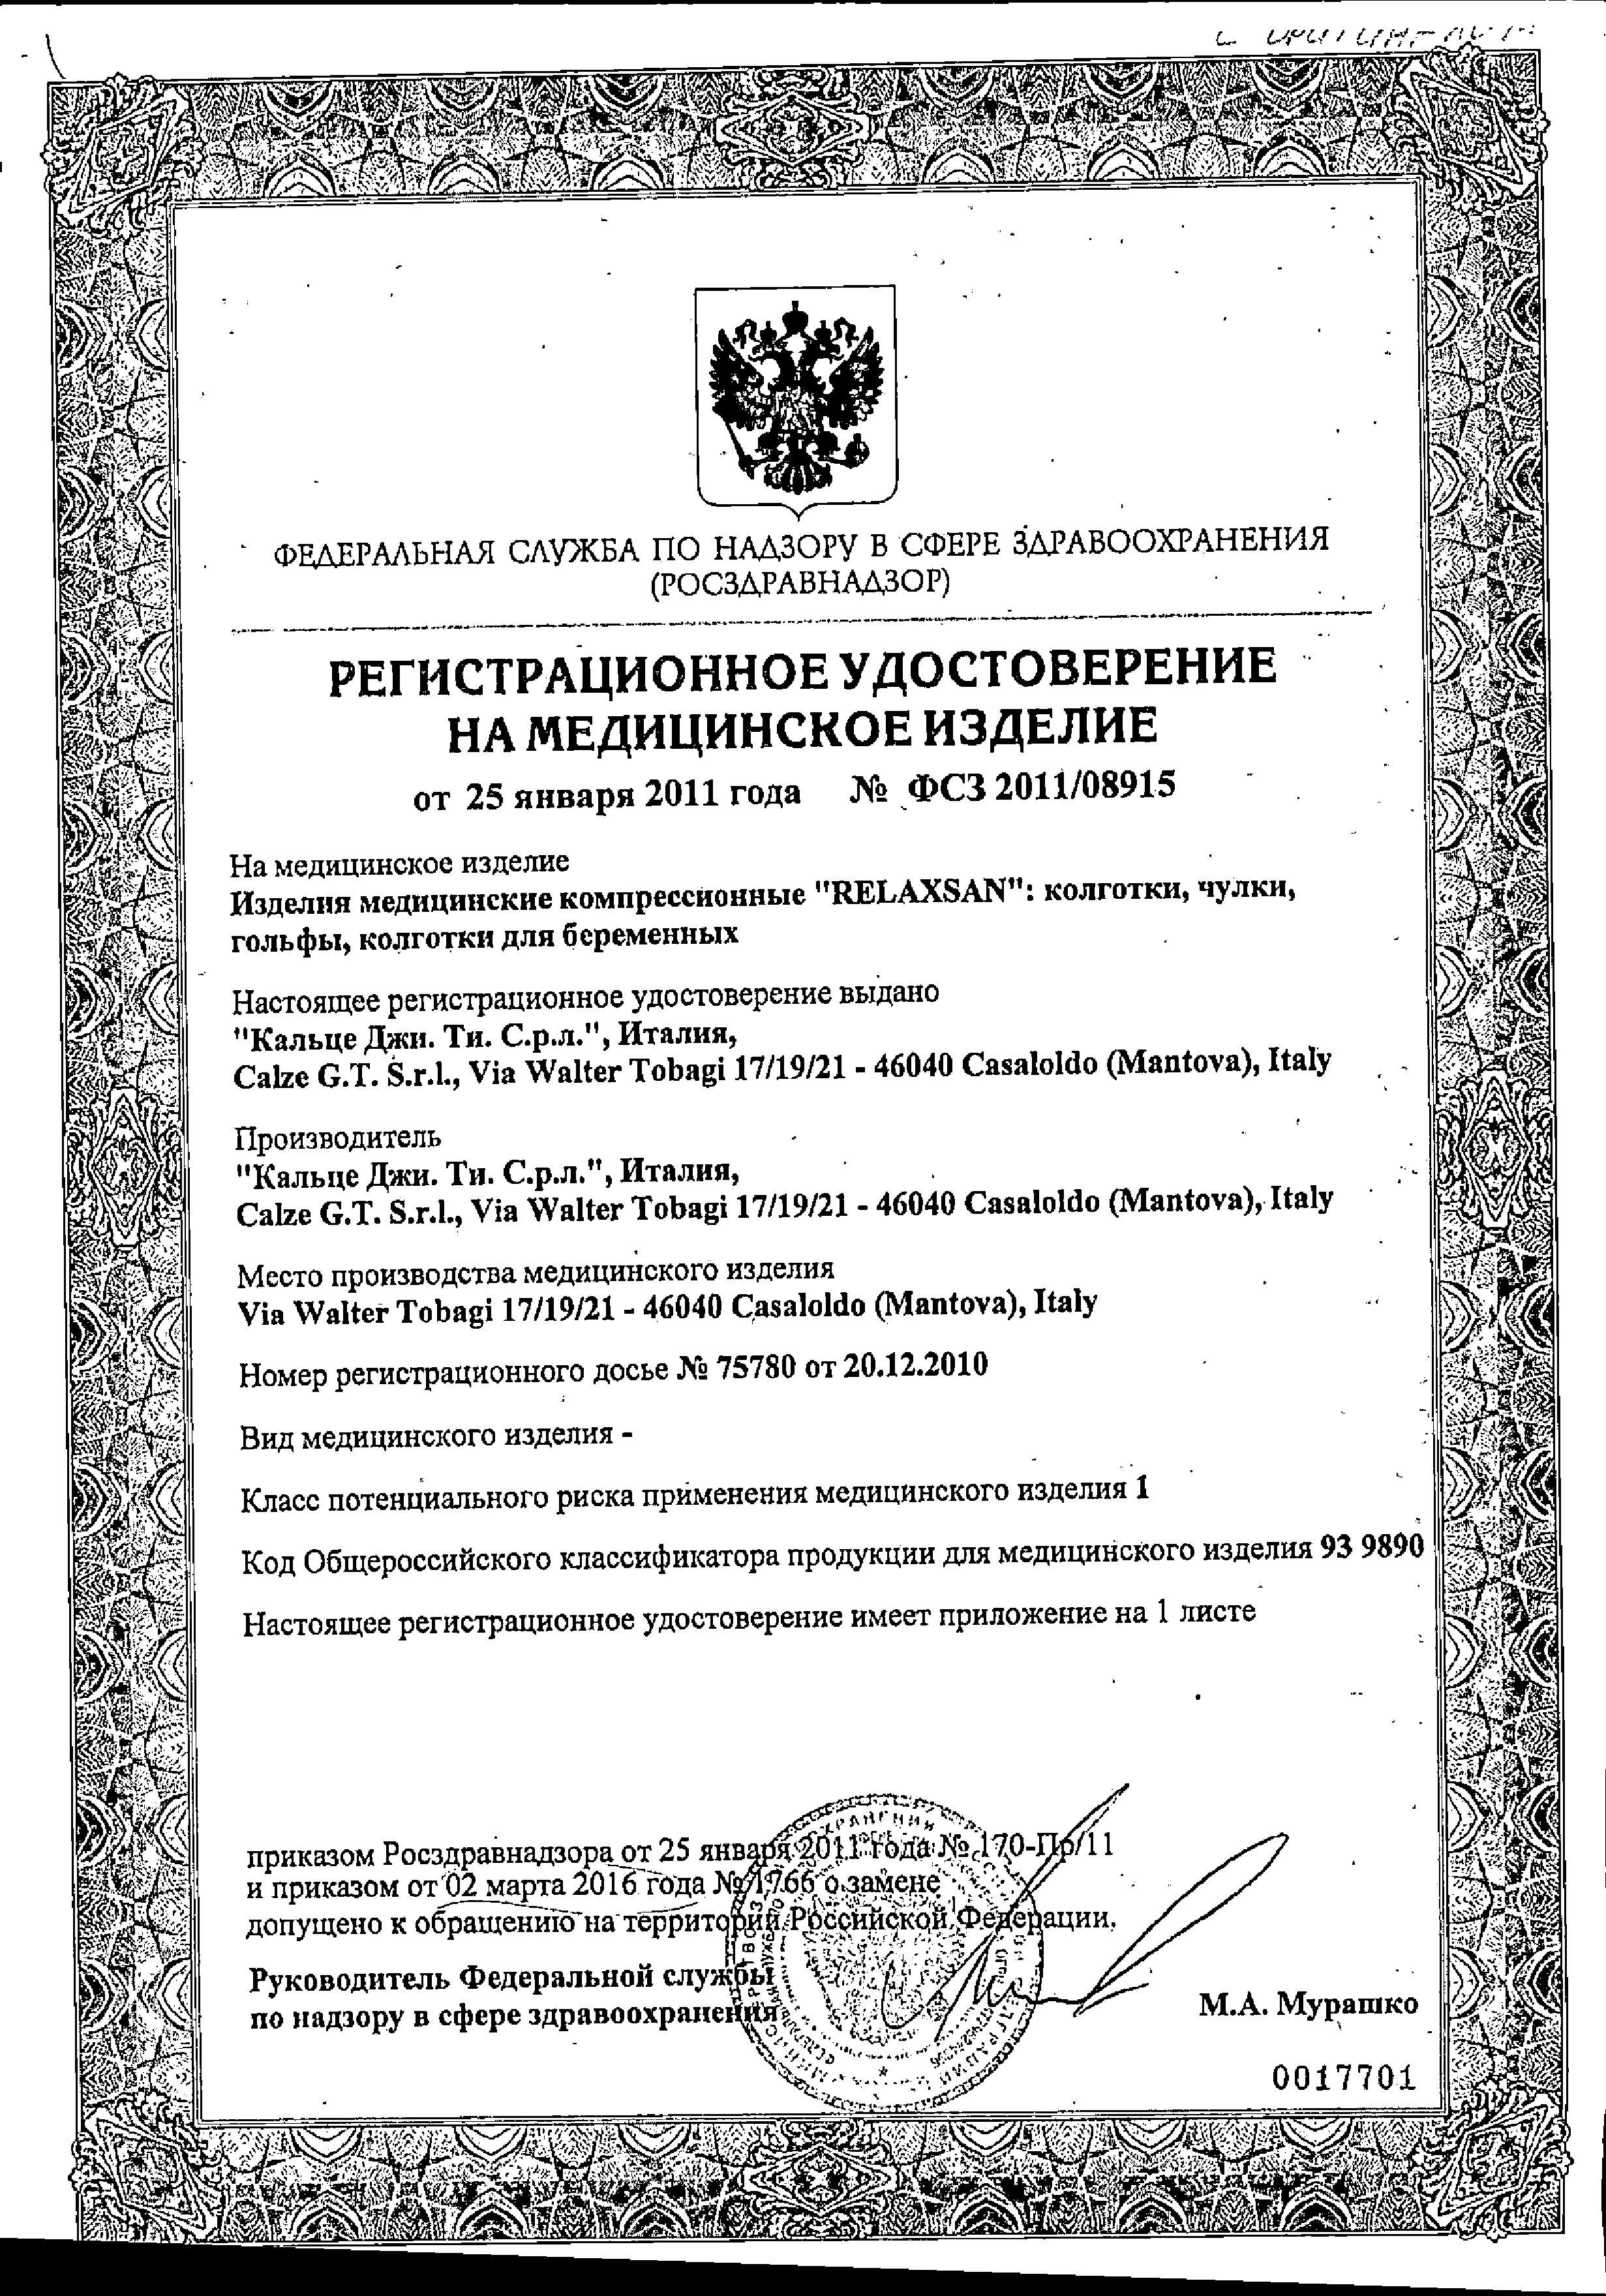 Relaxsan Lady Collant Колготки 1 класс компрессии сертификат